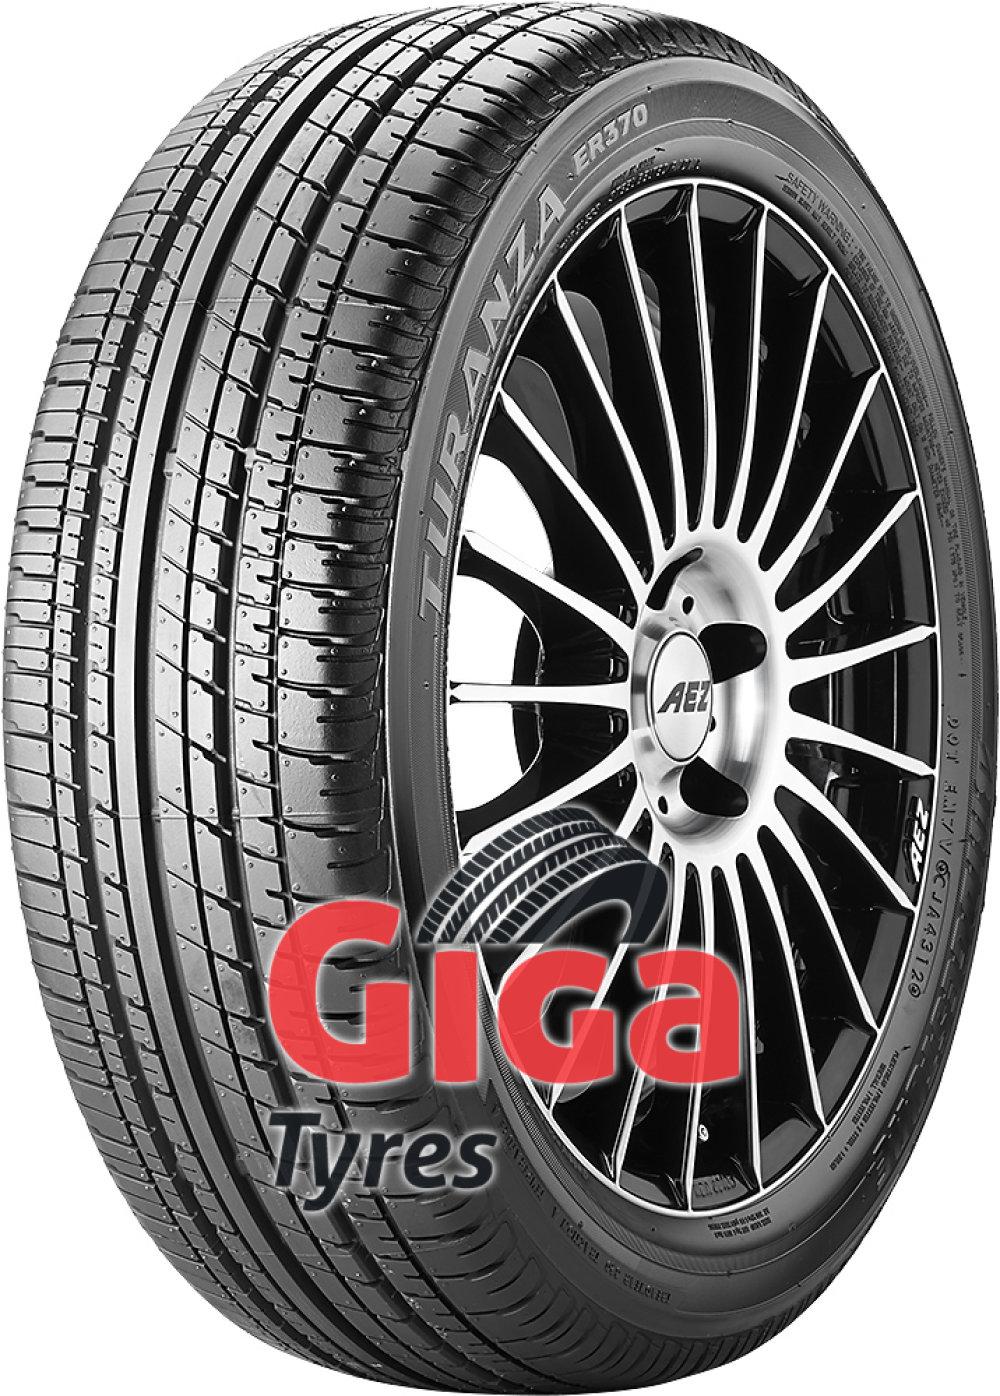 Bridgestone Turanza ER 370 ( 225/50 R17 98V XL with rim protection (MFS) )